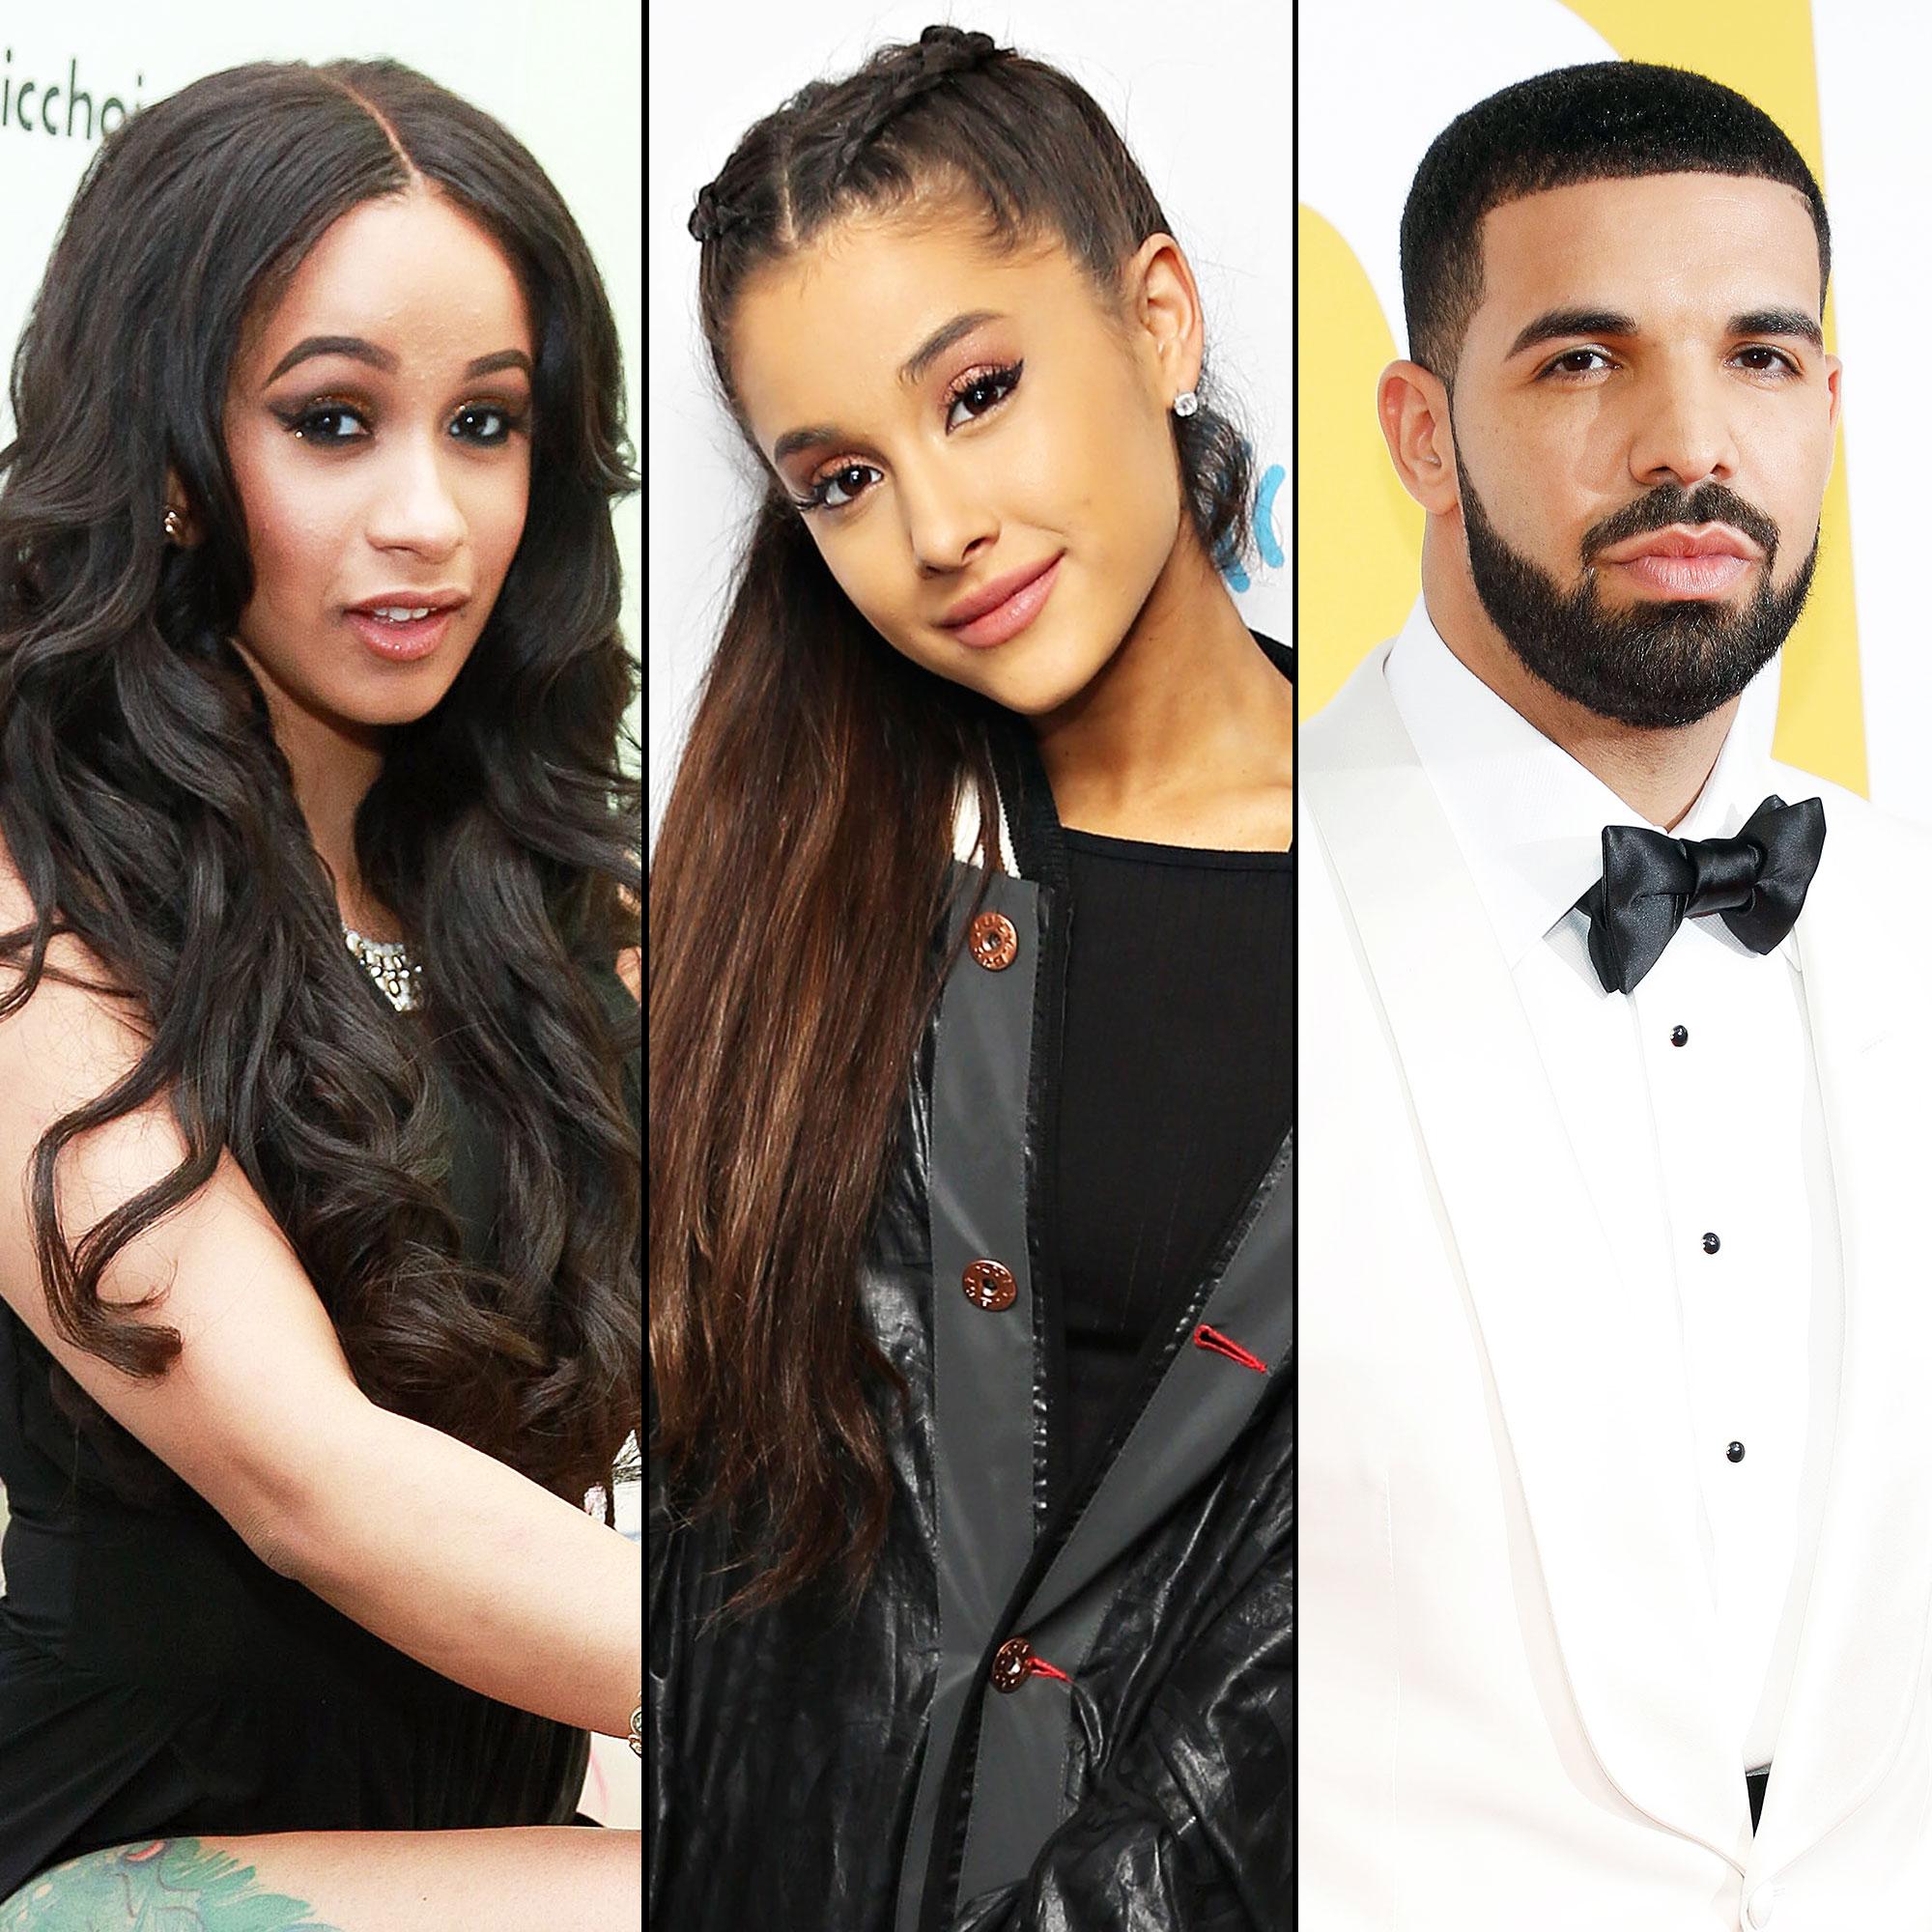 2019 iHeartRadio Music Awards: Full List of Winners